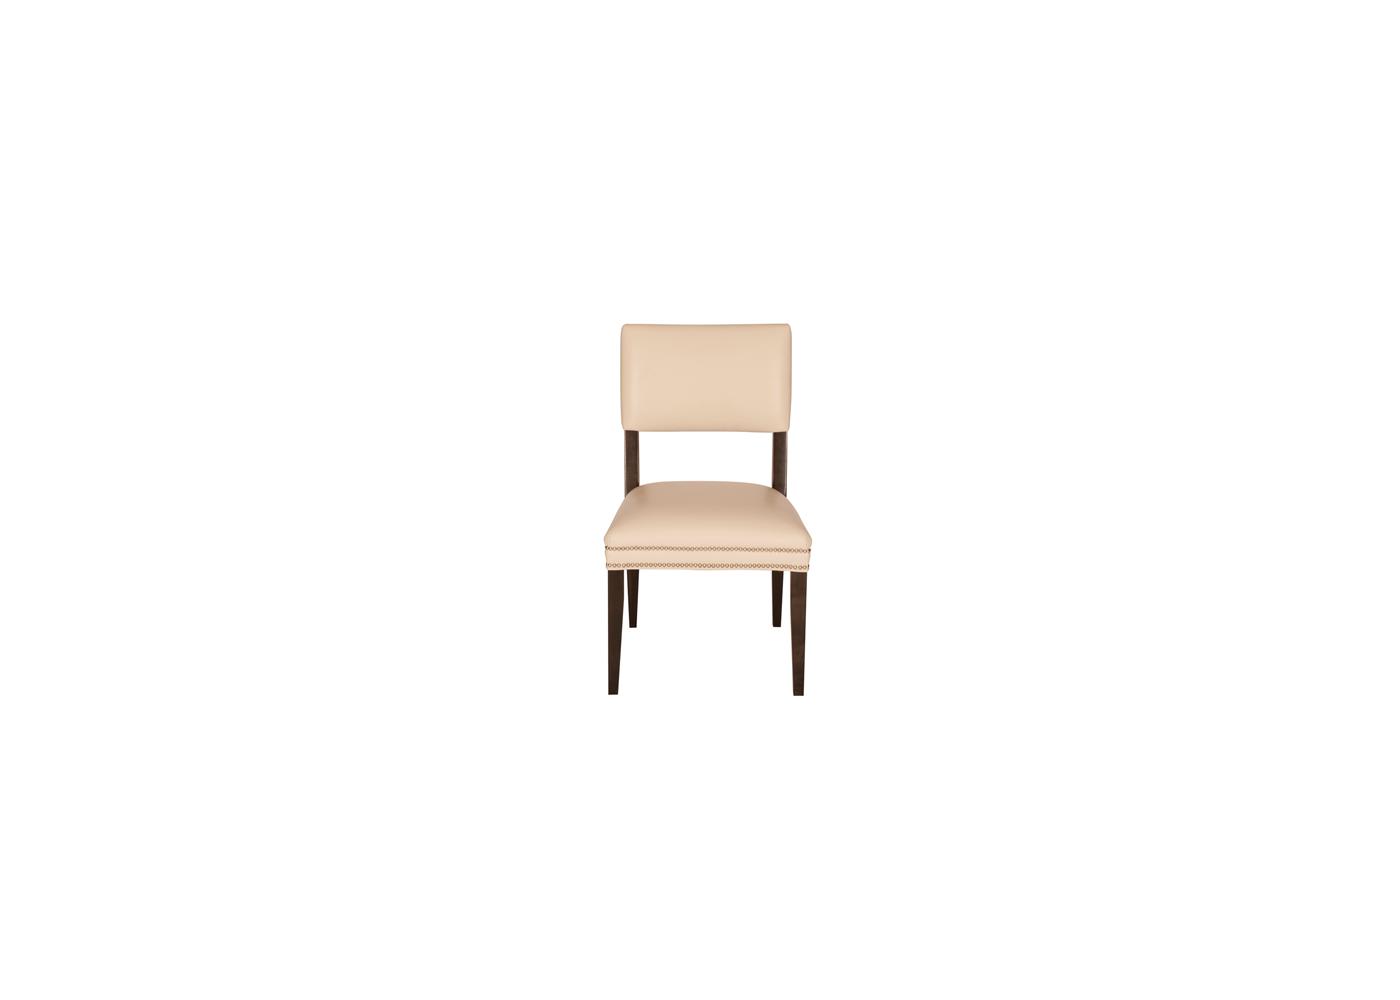 Polanco home furniture interior decor solutions dining for Polanco home furniture interior decor solutions